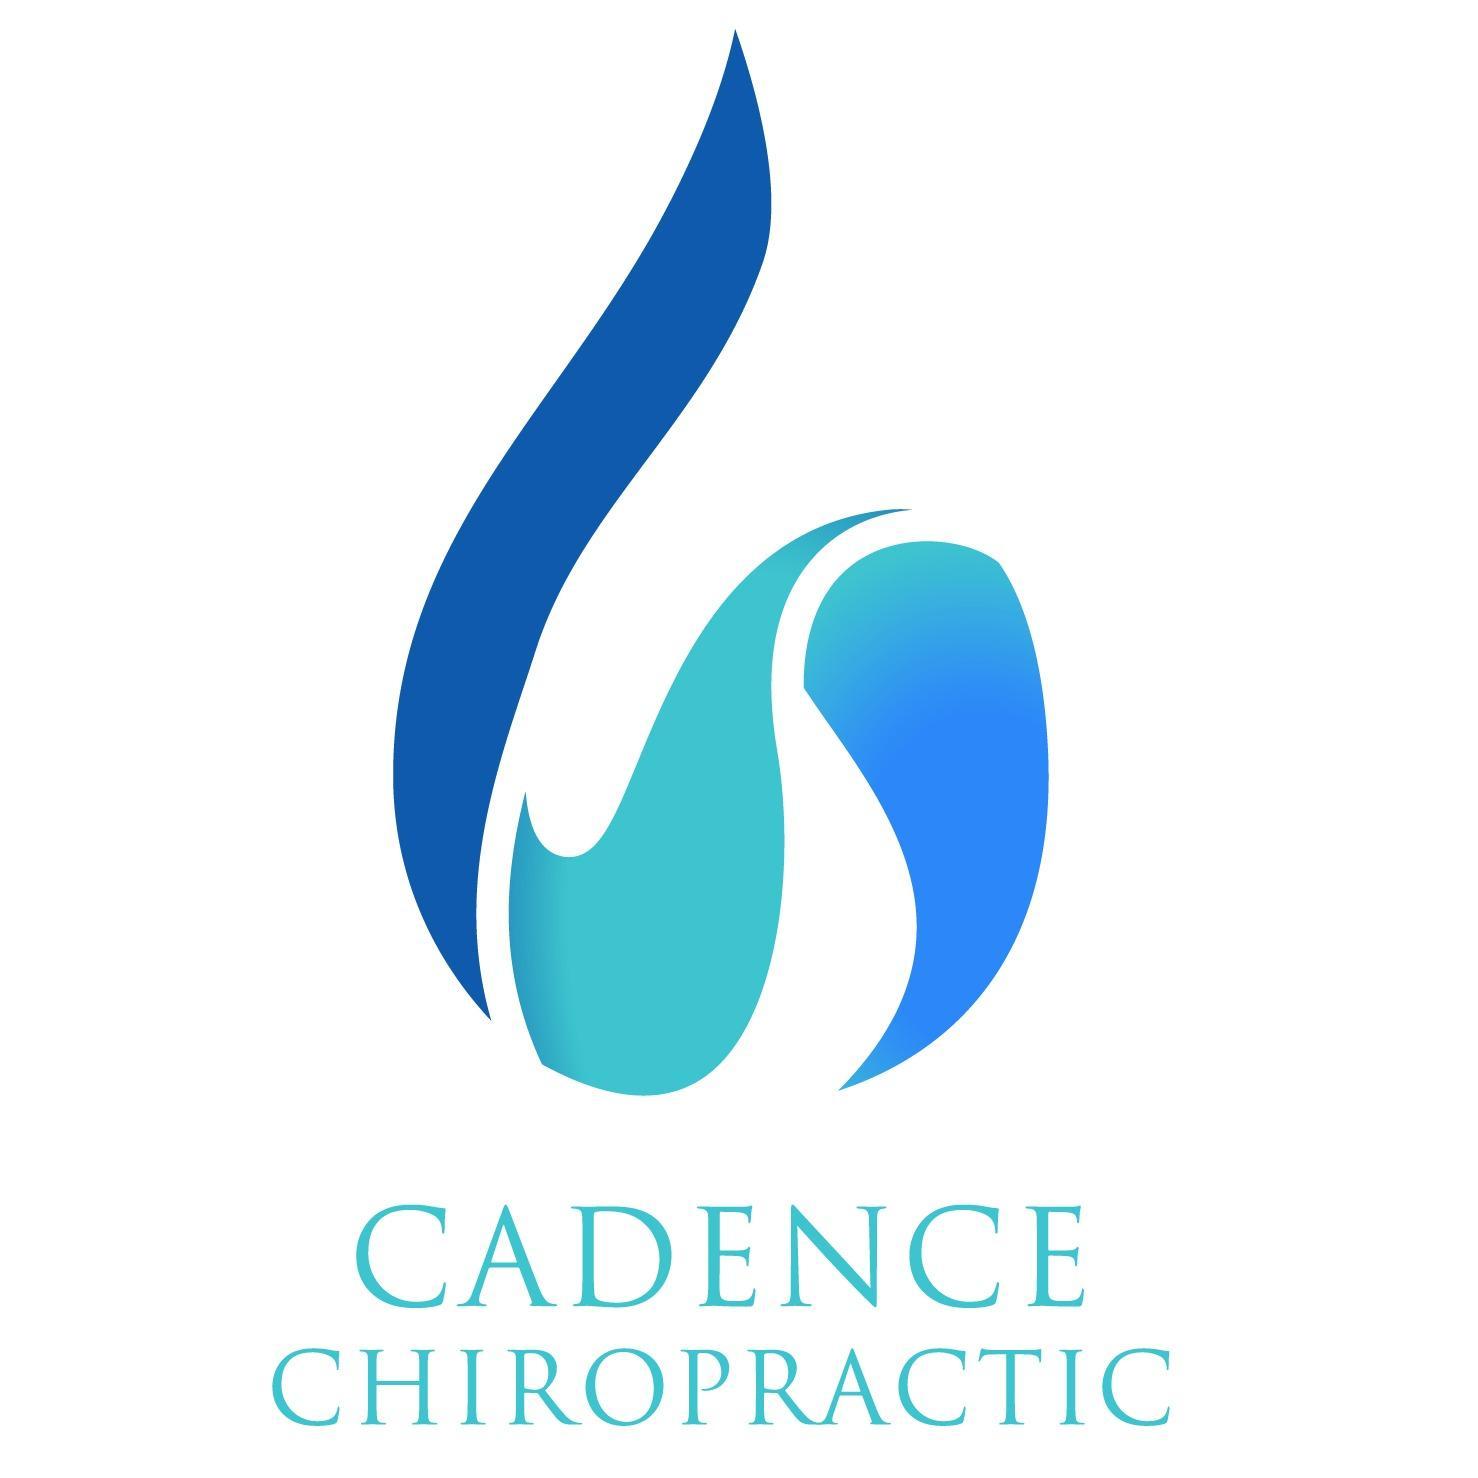 Cadence Chiropractic